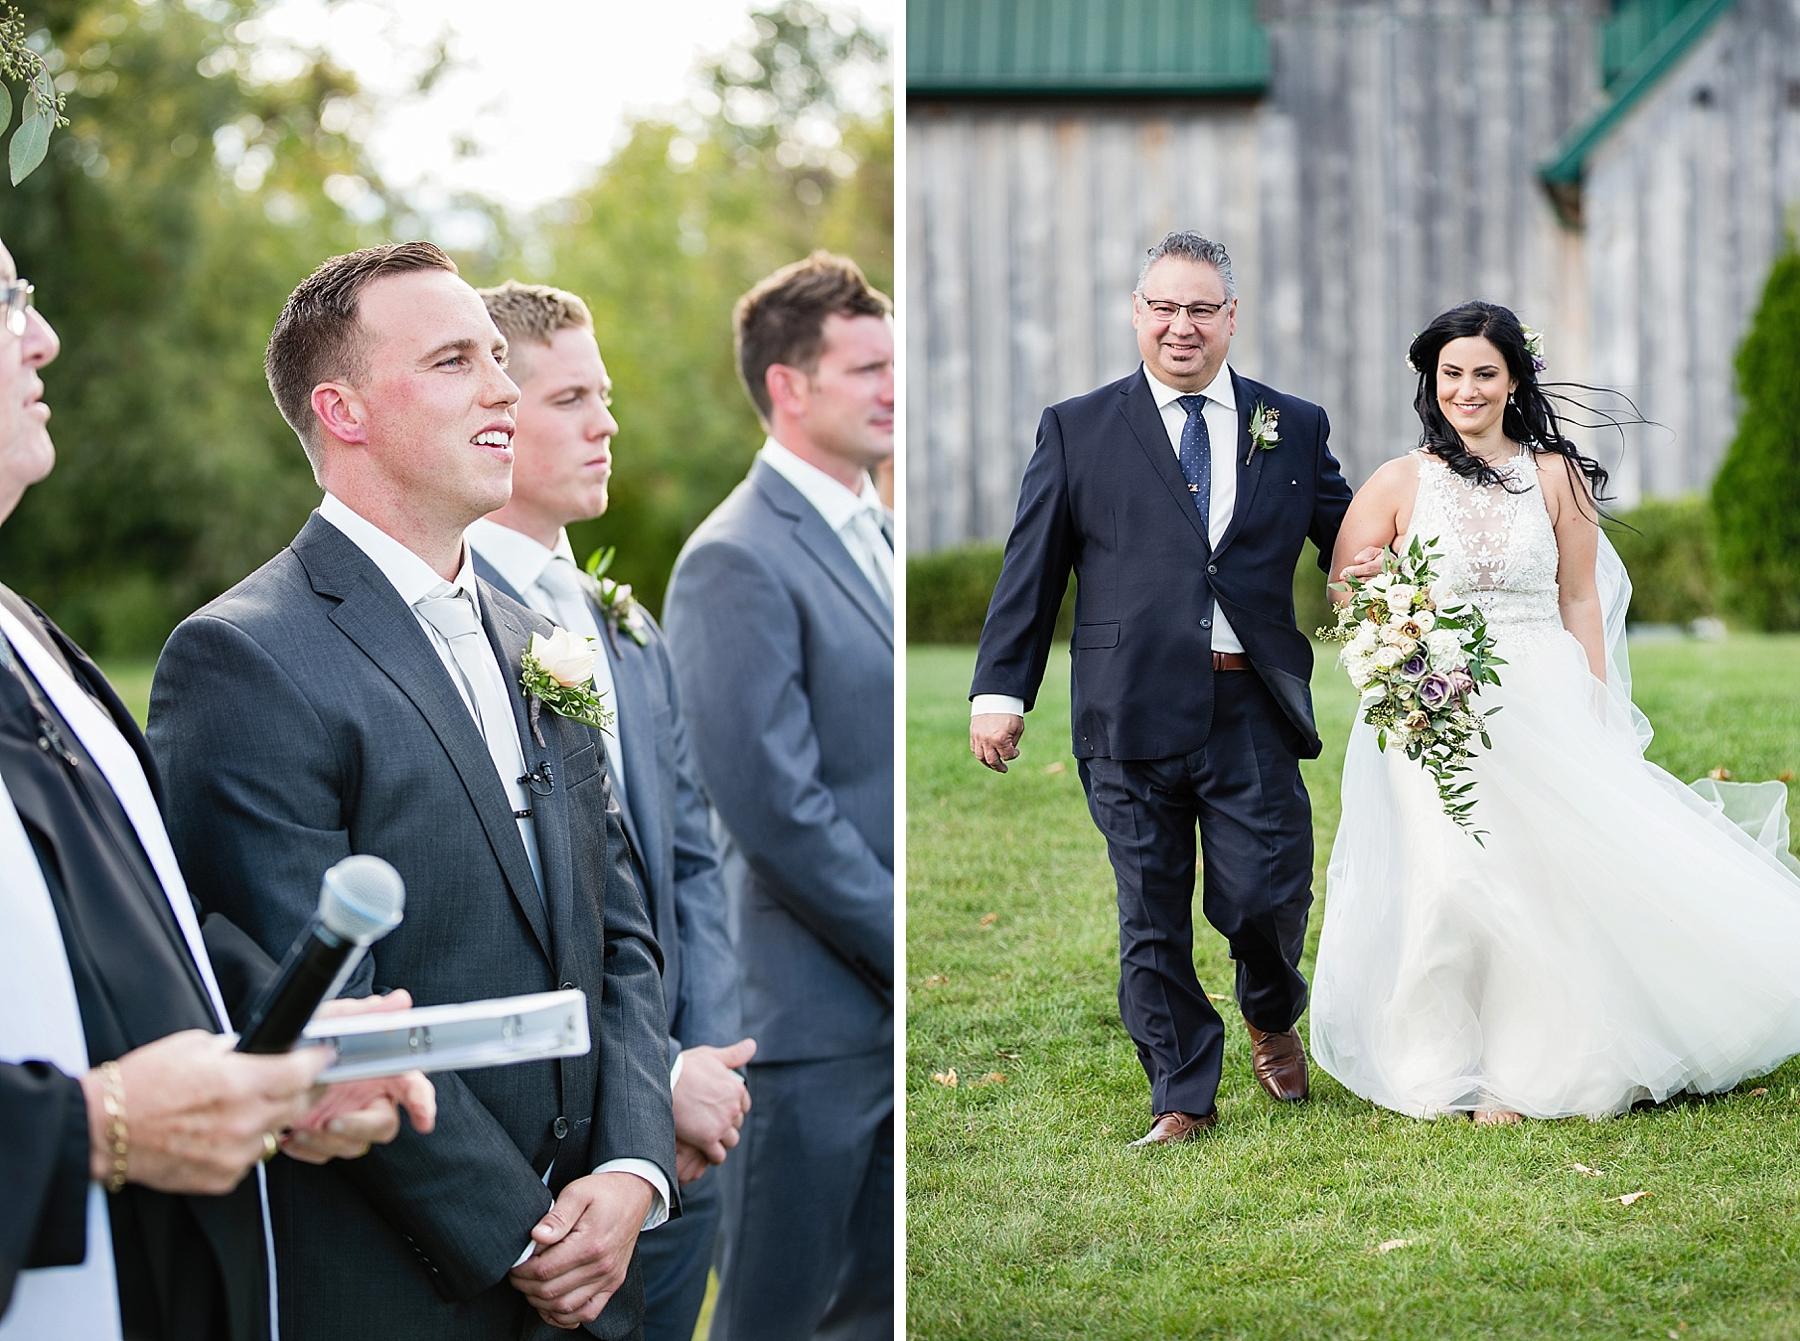 windsor-wedding-photographer-sprucewood-shores-winery-wedding-niagara-on-the-lake-wedding-photographer-eryn-shea-photography_0048.jpg